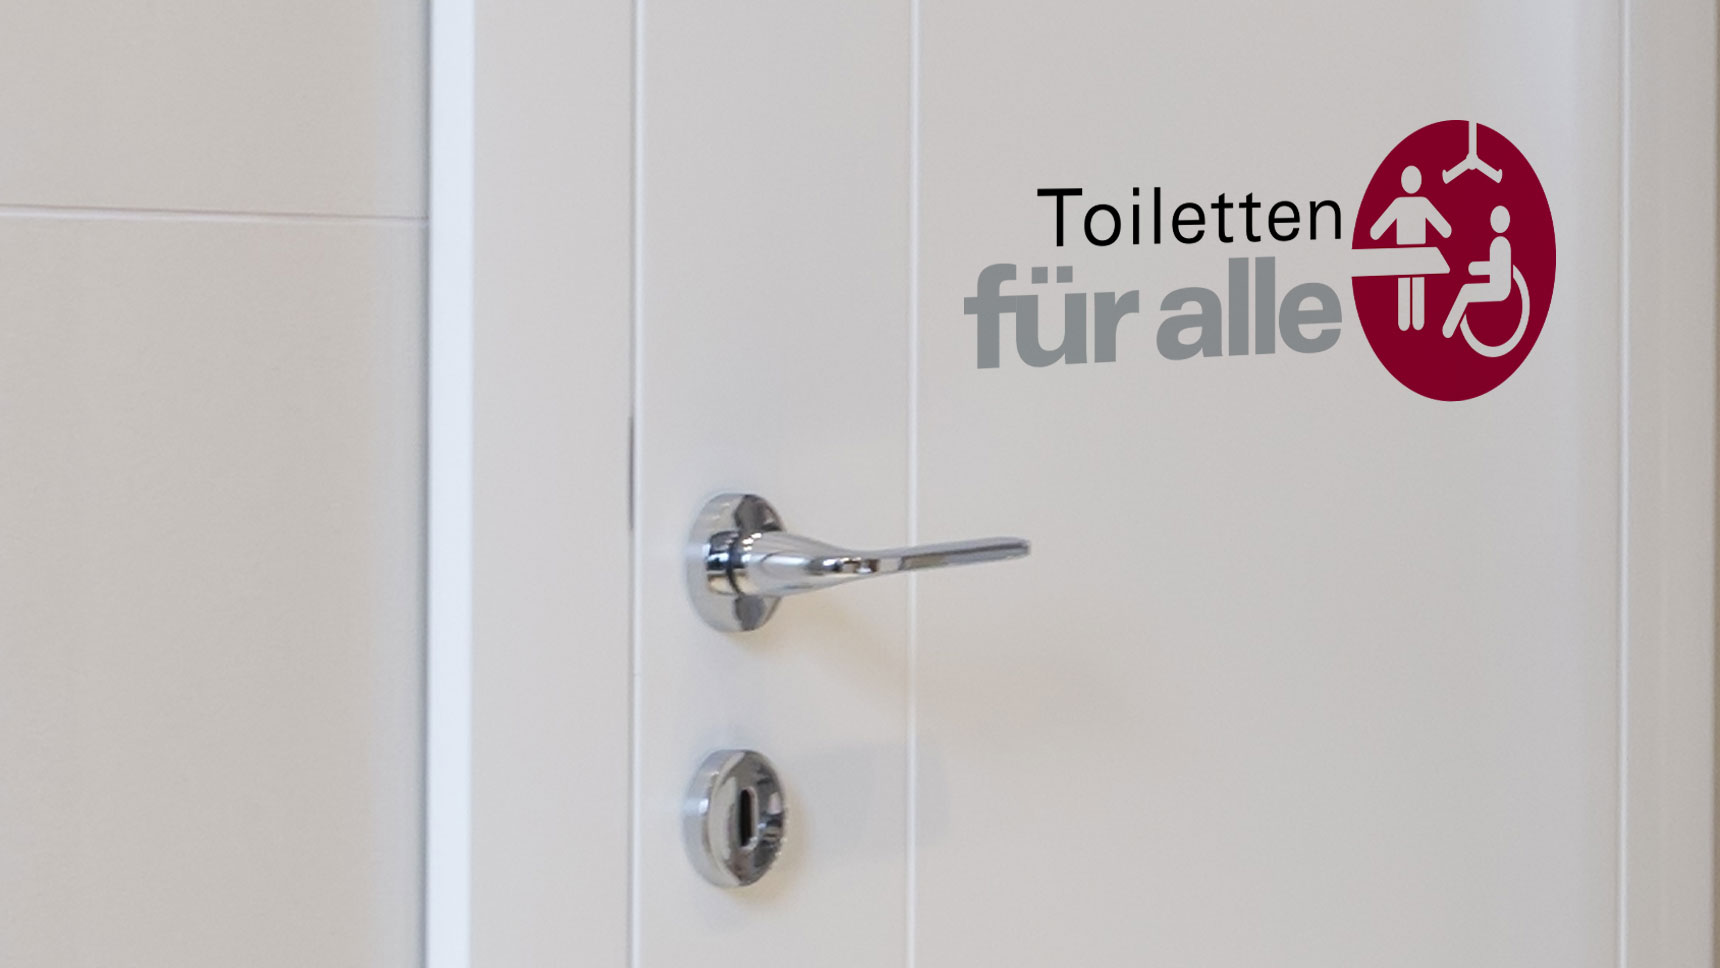 bayern barrierefrei besuch toiletten f r alle. Black Bedroom Furniture Sets. Home Design Ideas